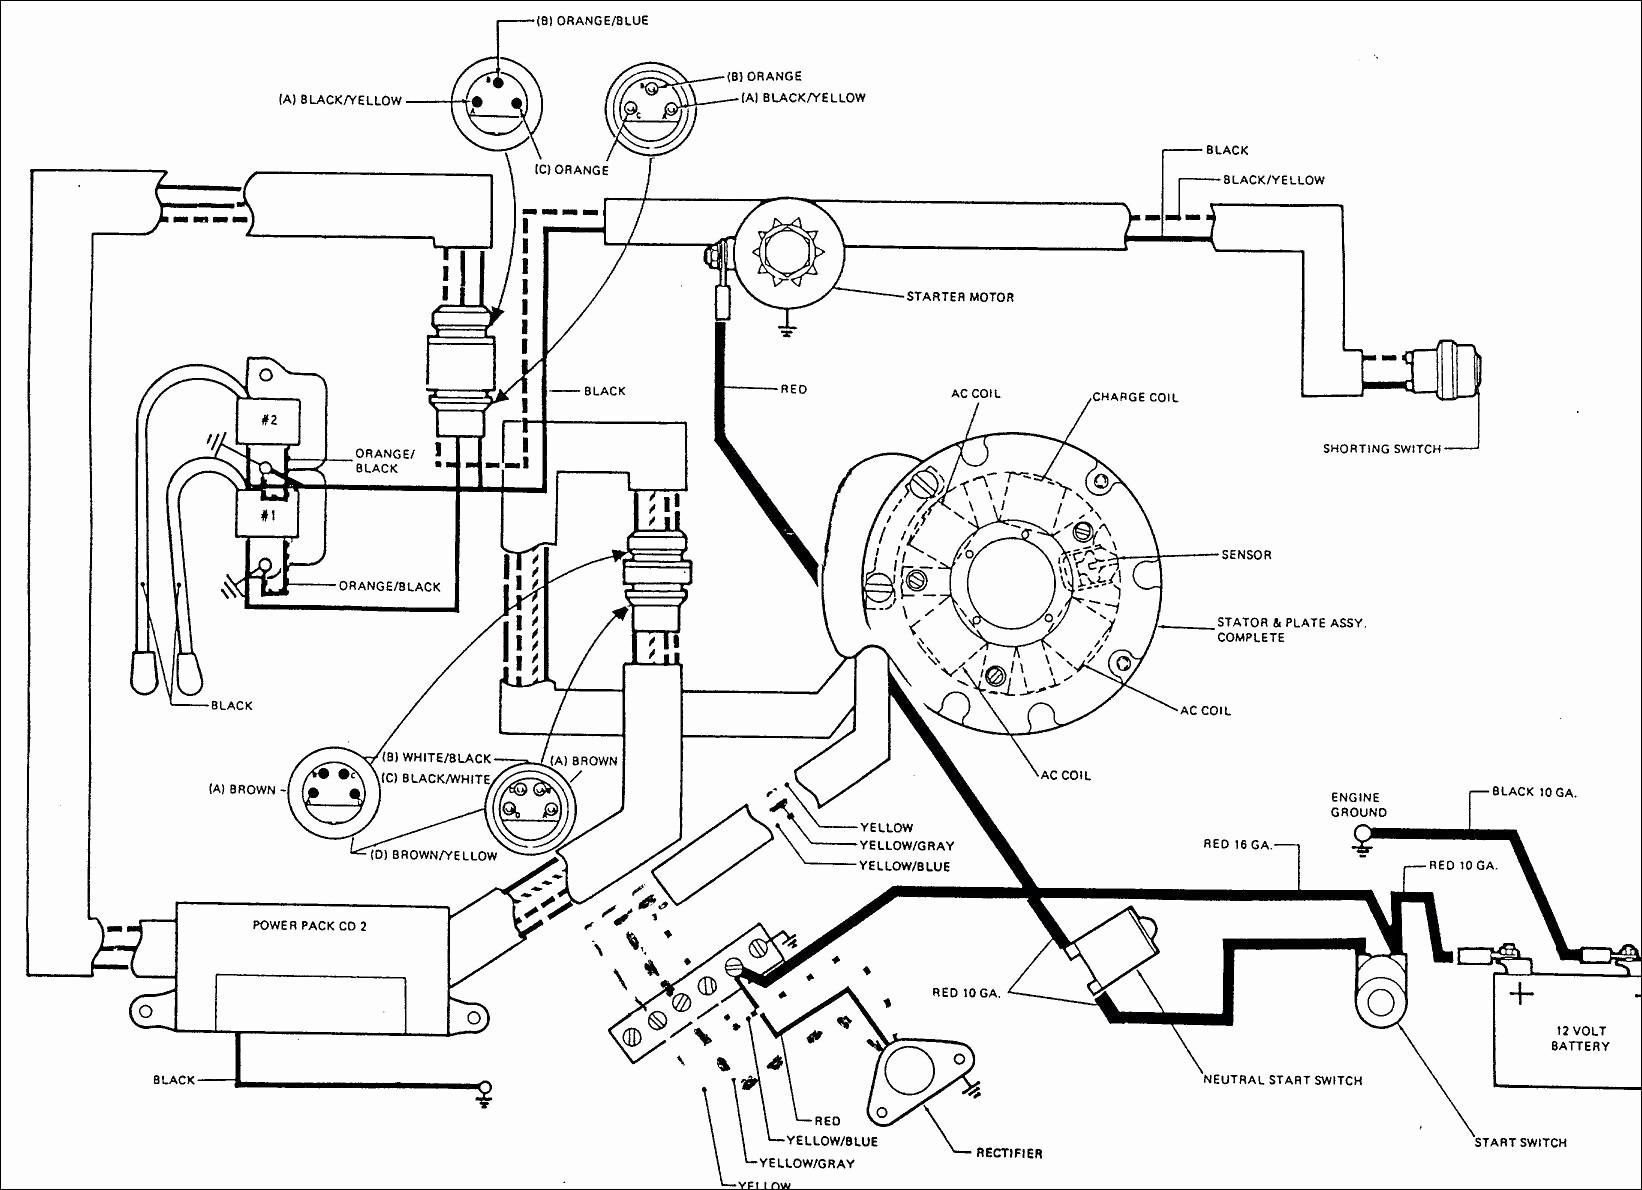 kandi 150cc engine wiring diagram howhit 150cc wiring diagram e1 wiring diagram  howhit 150cc wiring diagram e1 wiring